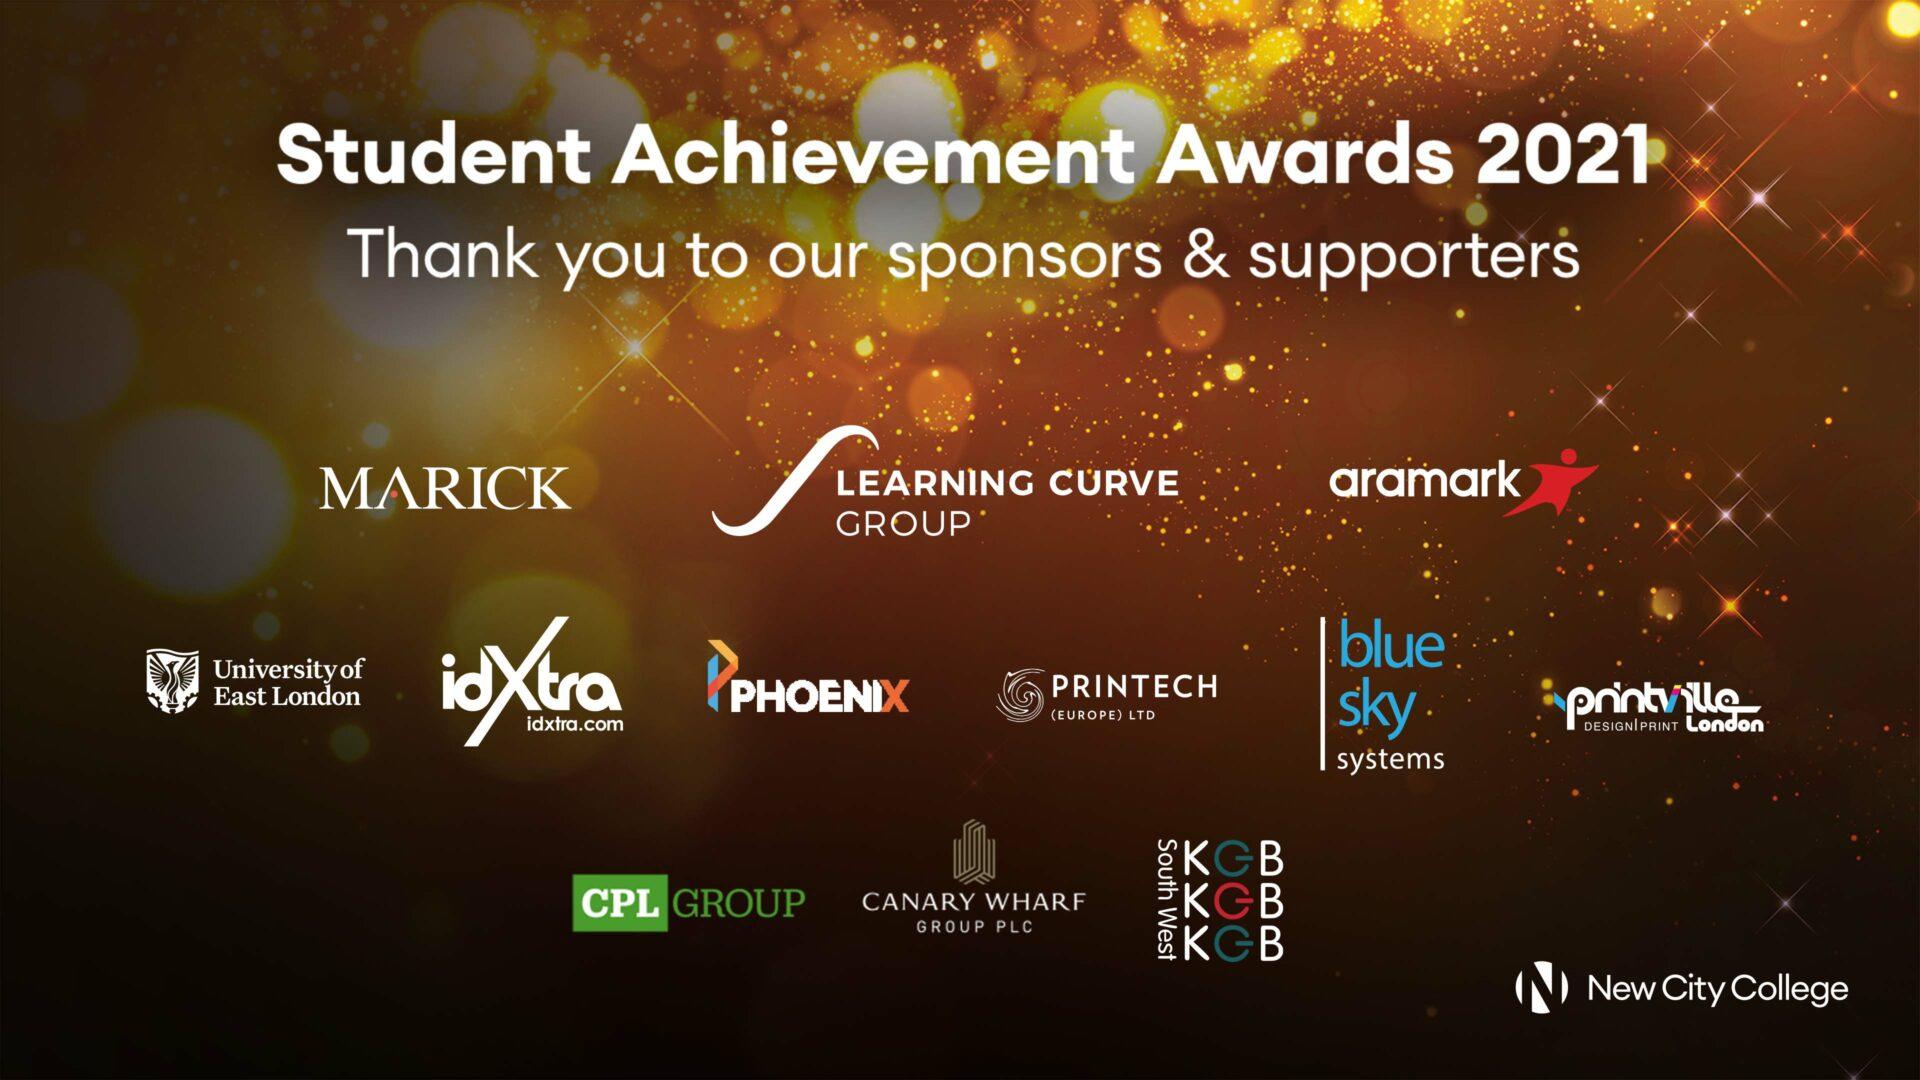 Student Achievement Awards 2021